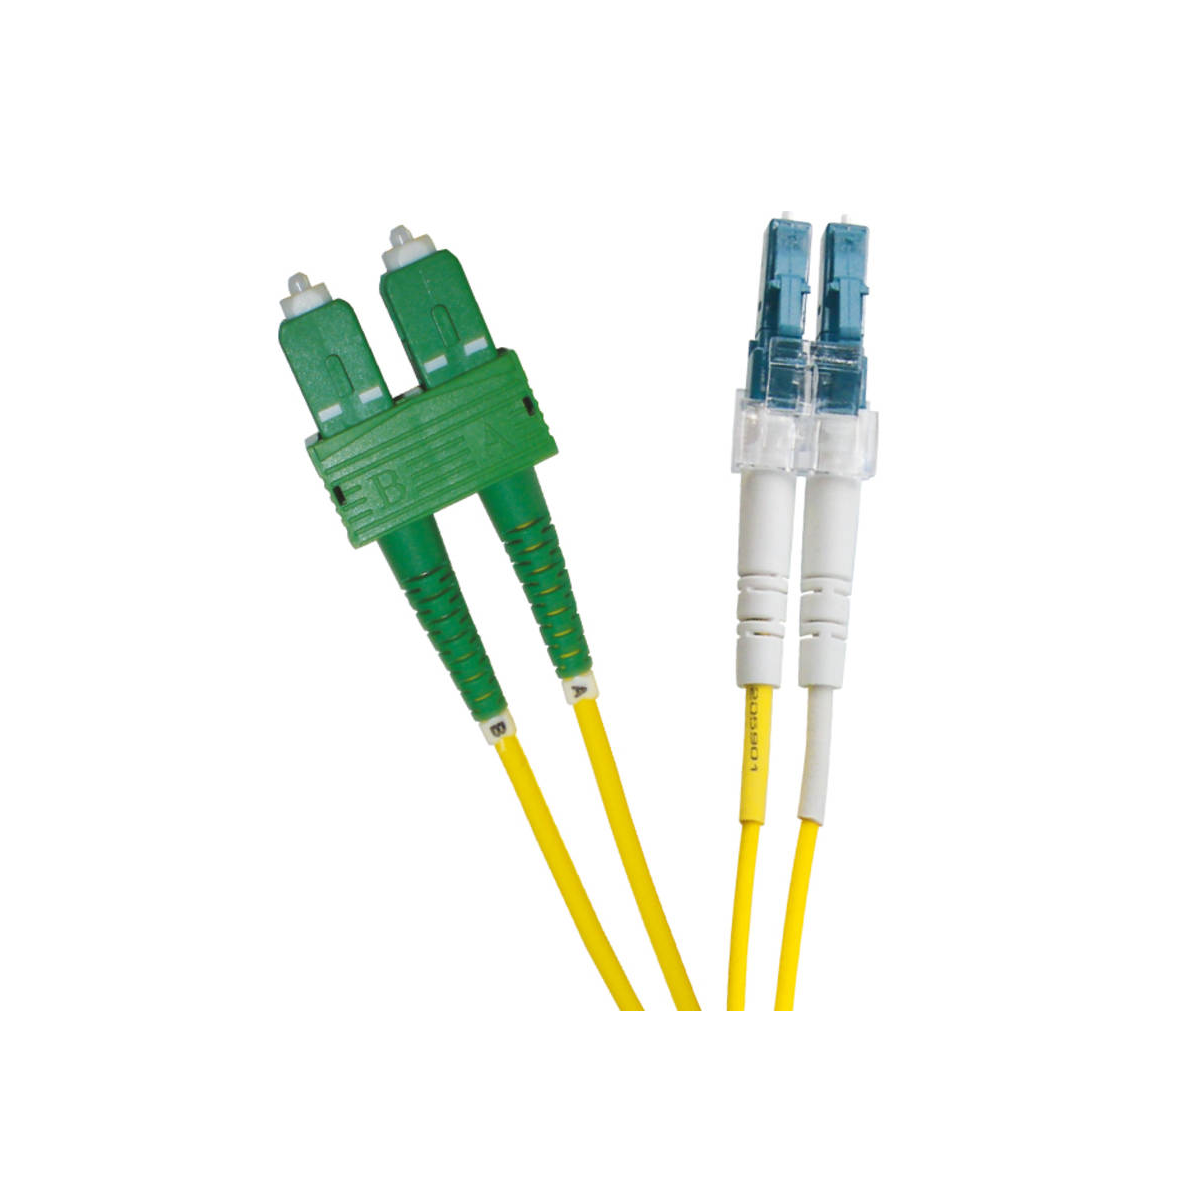 EXCEL OS2 1M LC-SCAPC DUPLEX P/LEAD 9/125